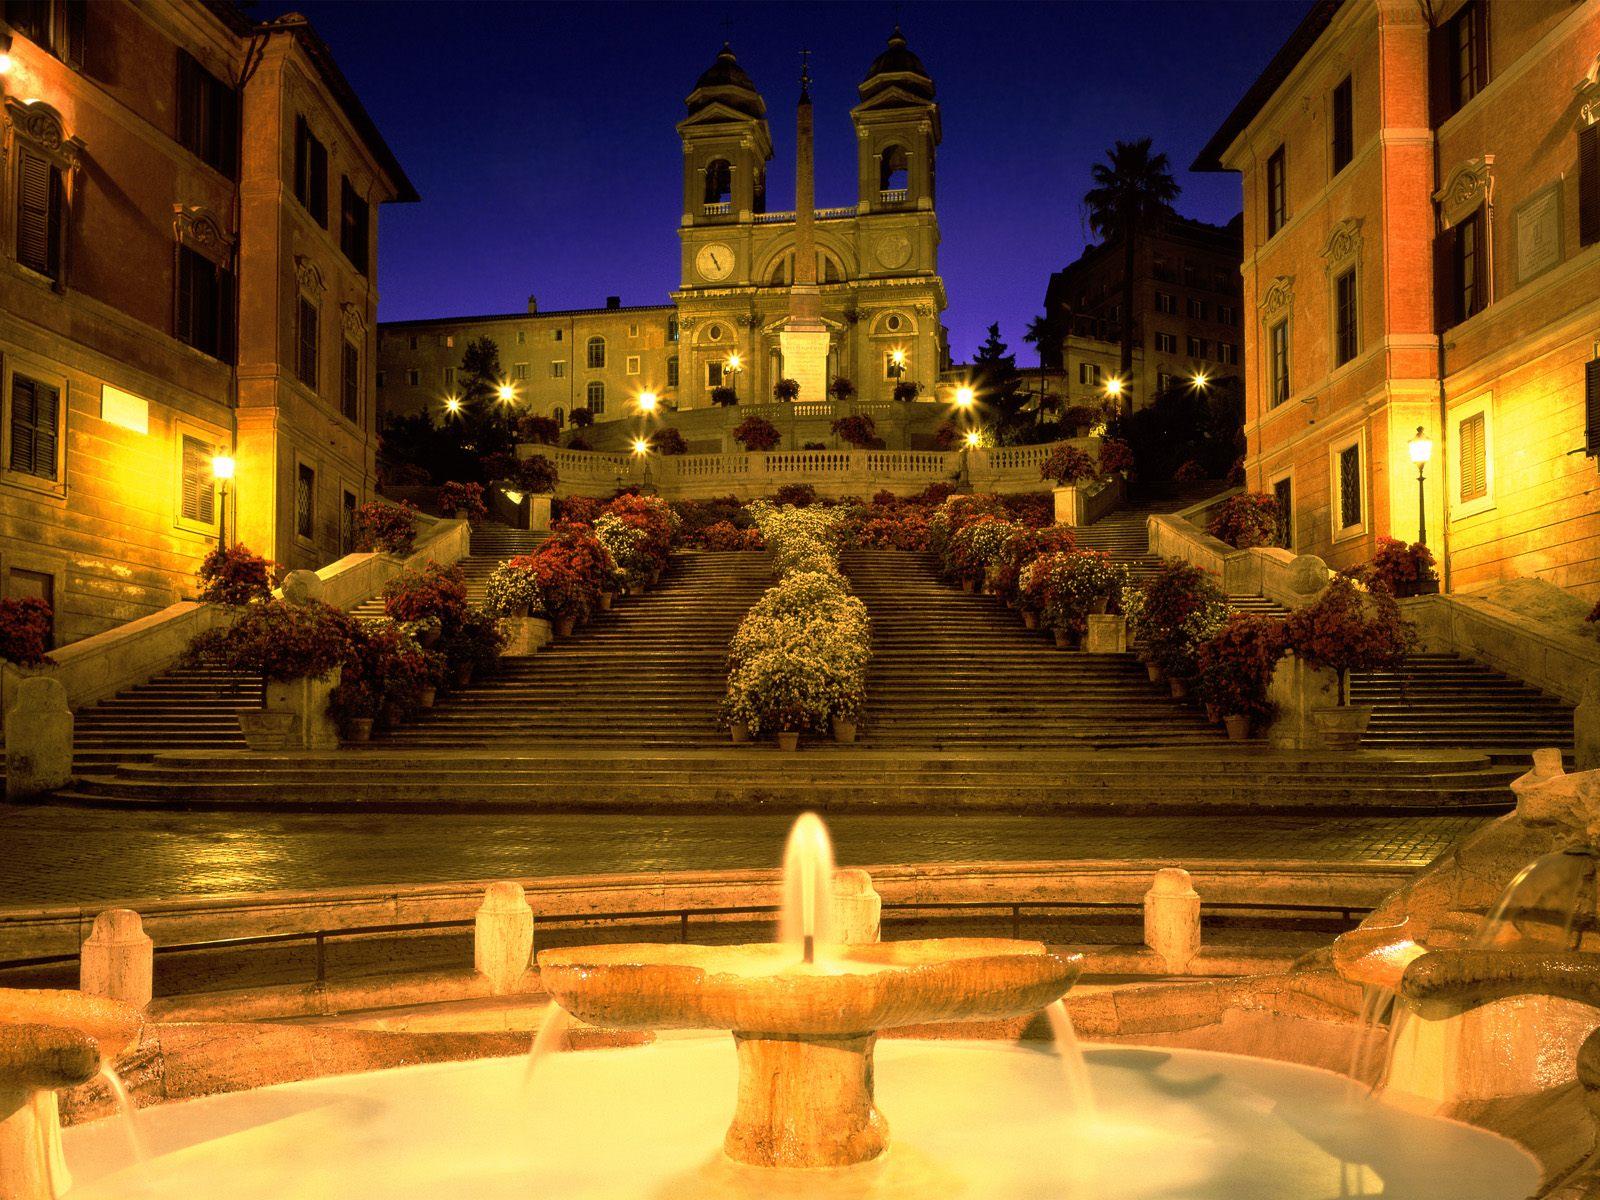 http://2.bp.blogspot.com/-isK6wuGCwnw/Tcp46KYn6fI/AAAAAAAACYU/dJHGdra0fcc/s1600/Trinita+dei+Monti+Church%252C+Spanish+Steps%252C+Rome%252C+Italy.jpg